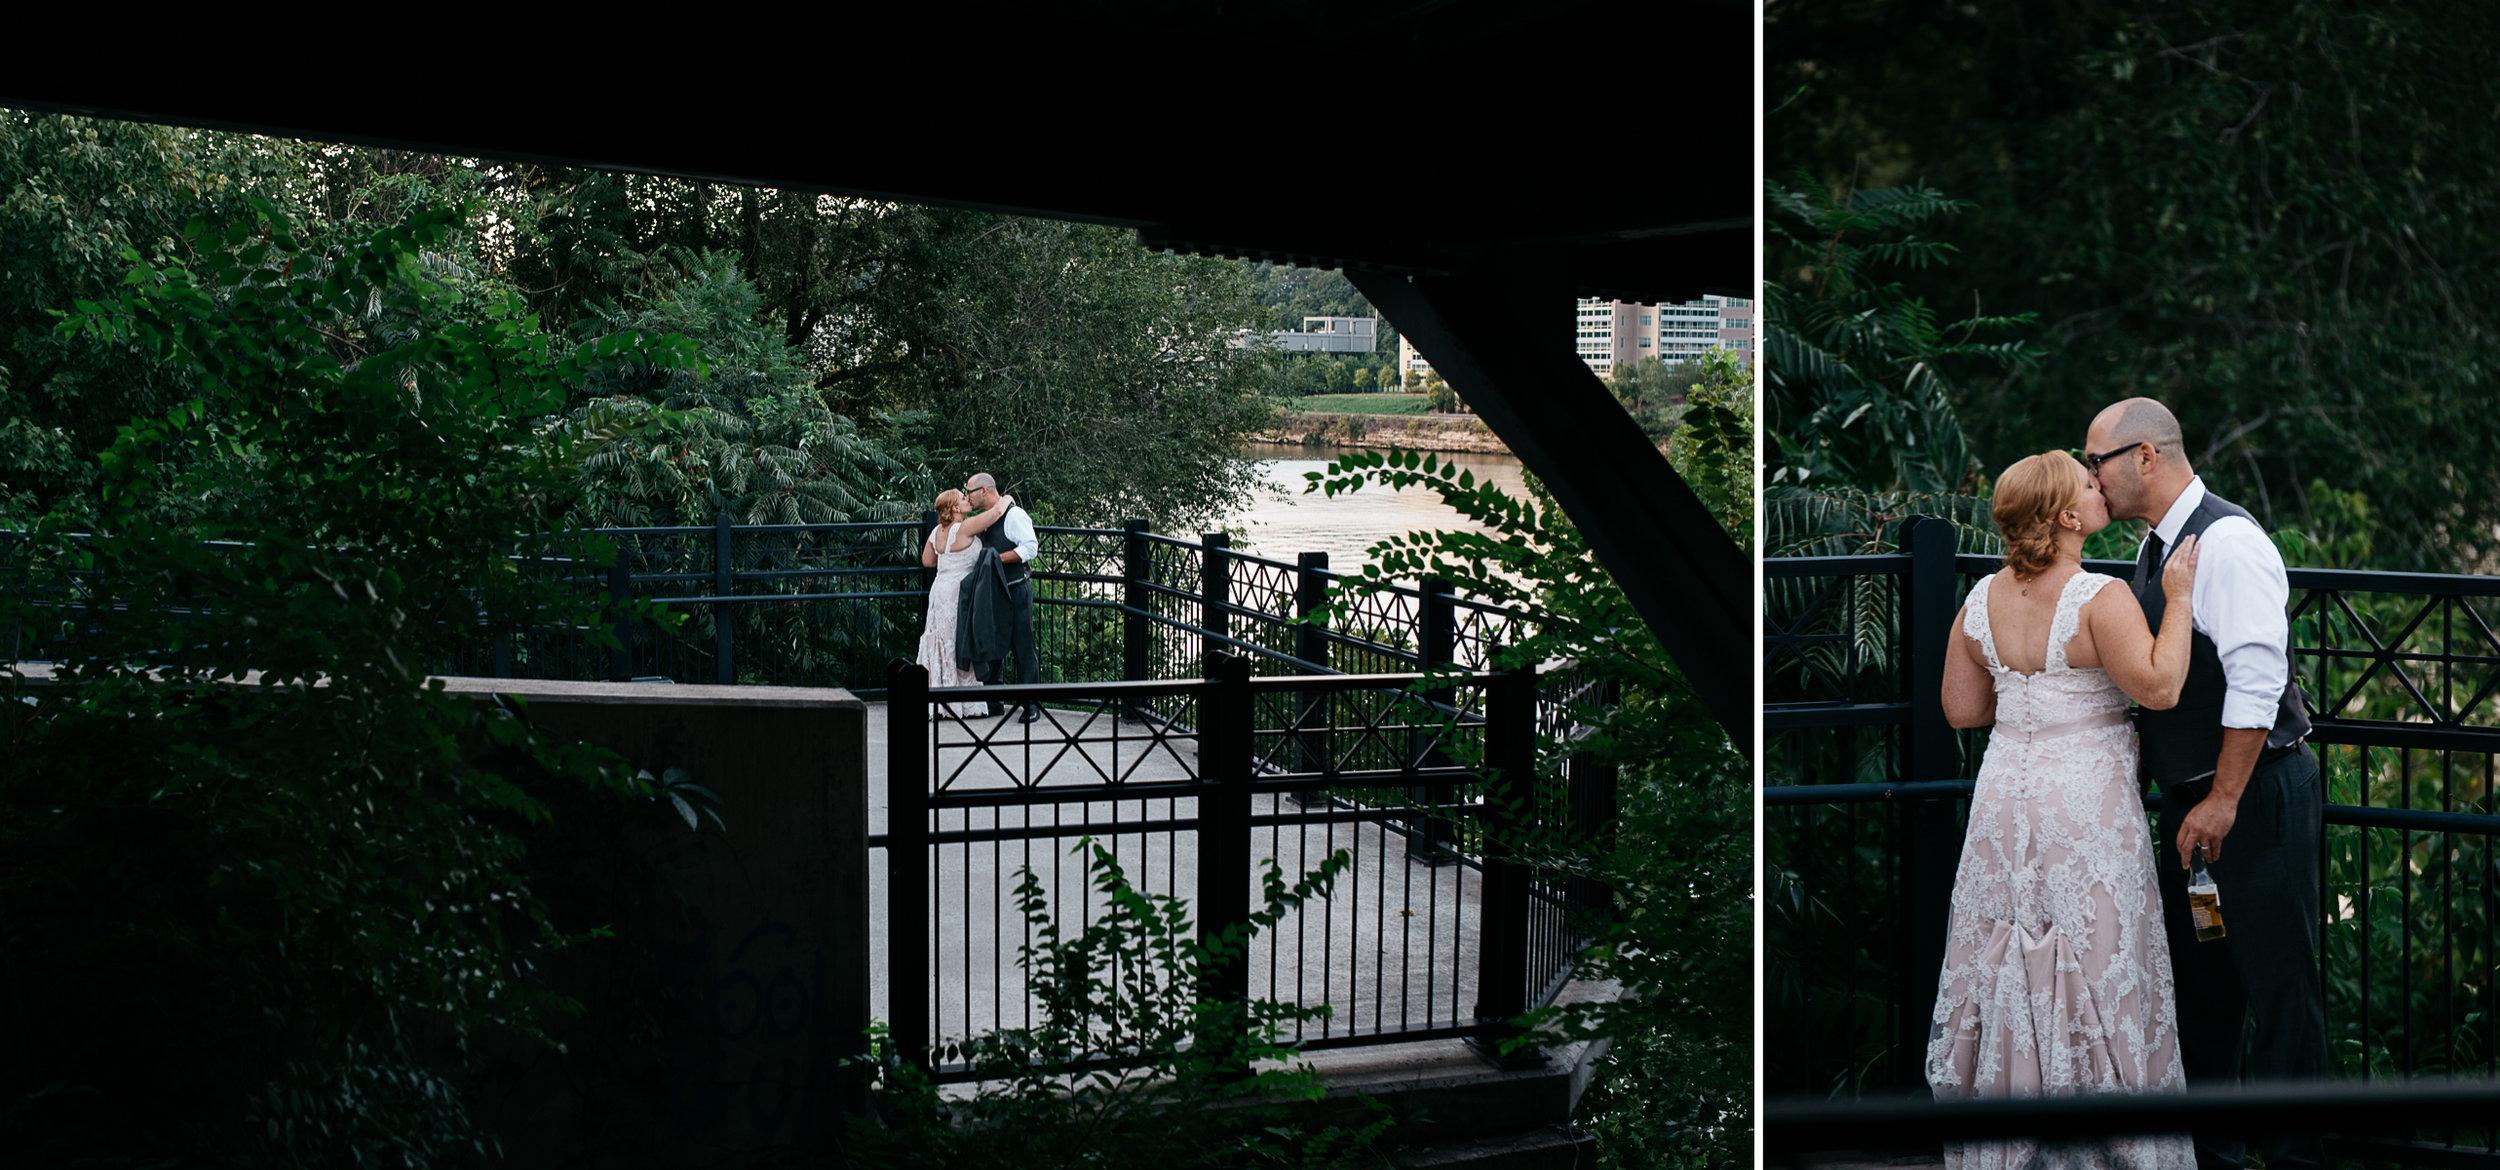 southside wedding photograhy portraits.jpg